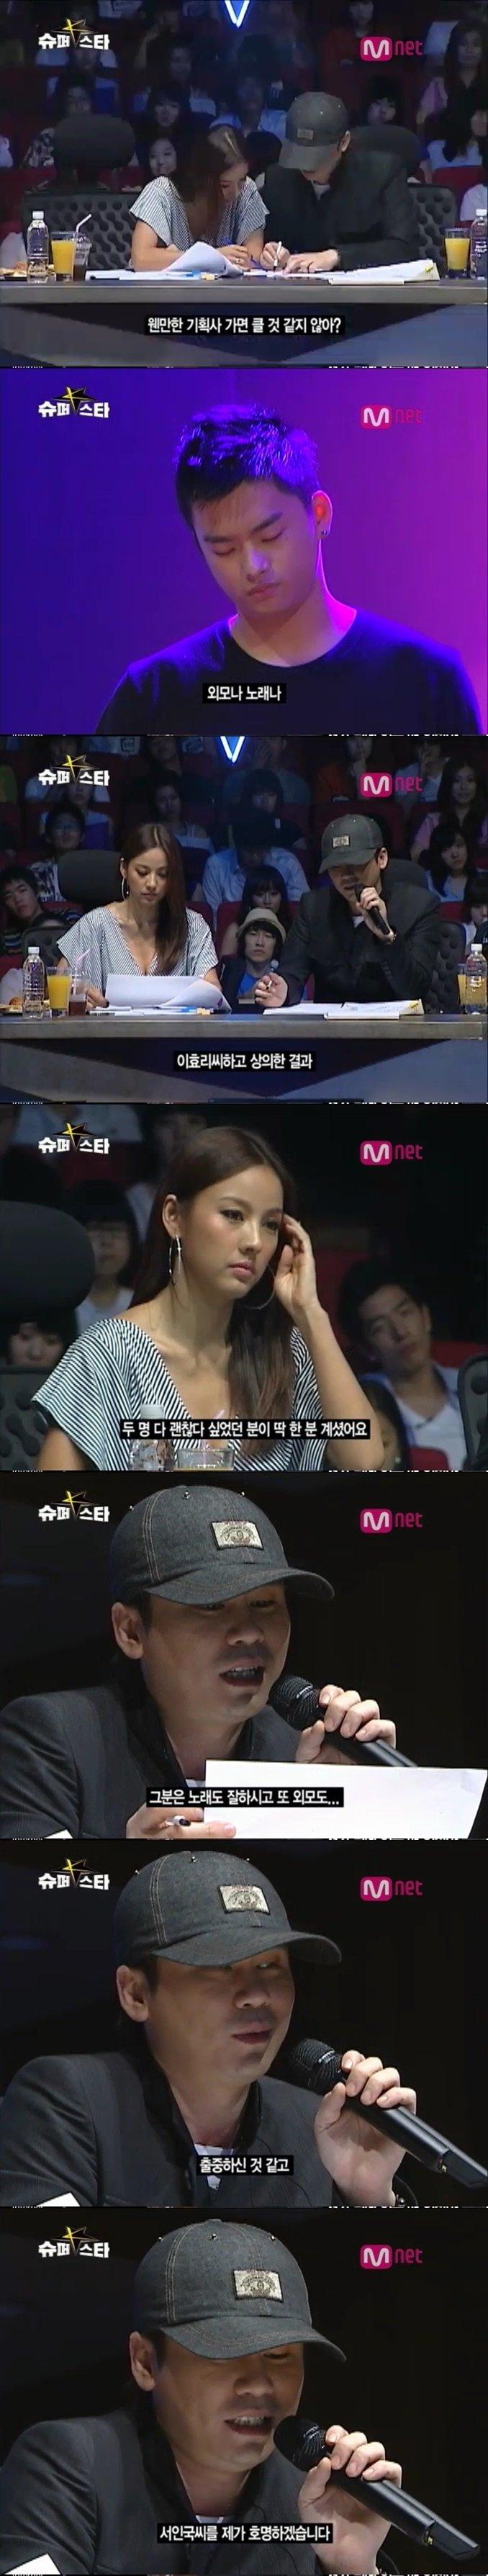 02.jpg 서인국이 연기로 뜰줄 알았떤 연예계 최고의 아이돌덕후.JPG